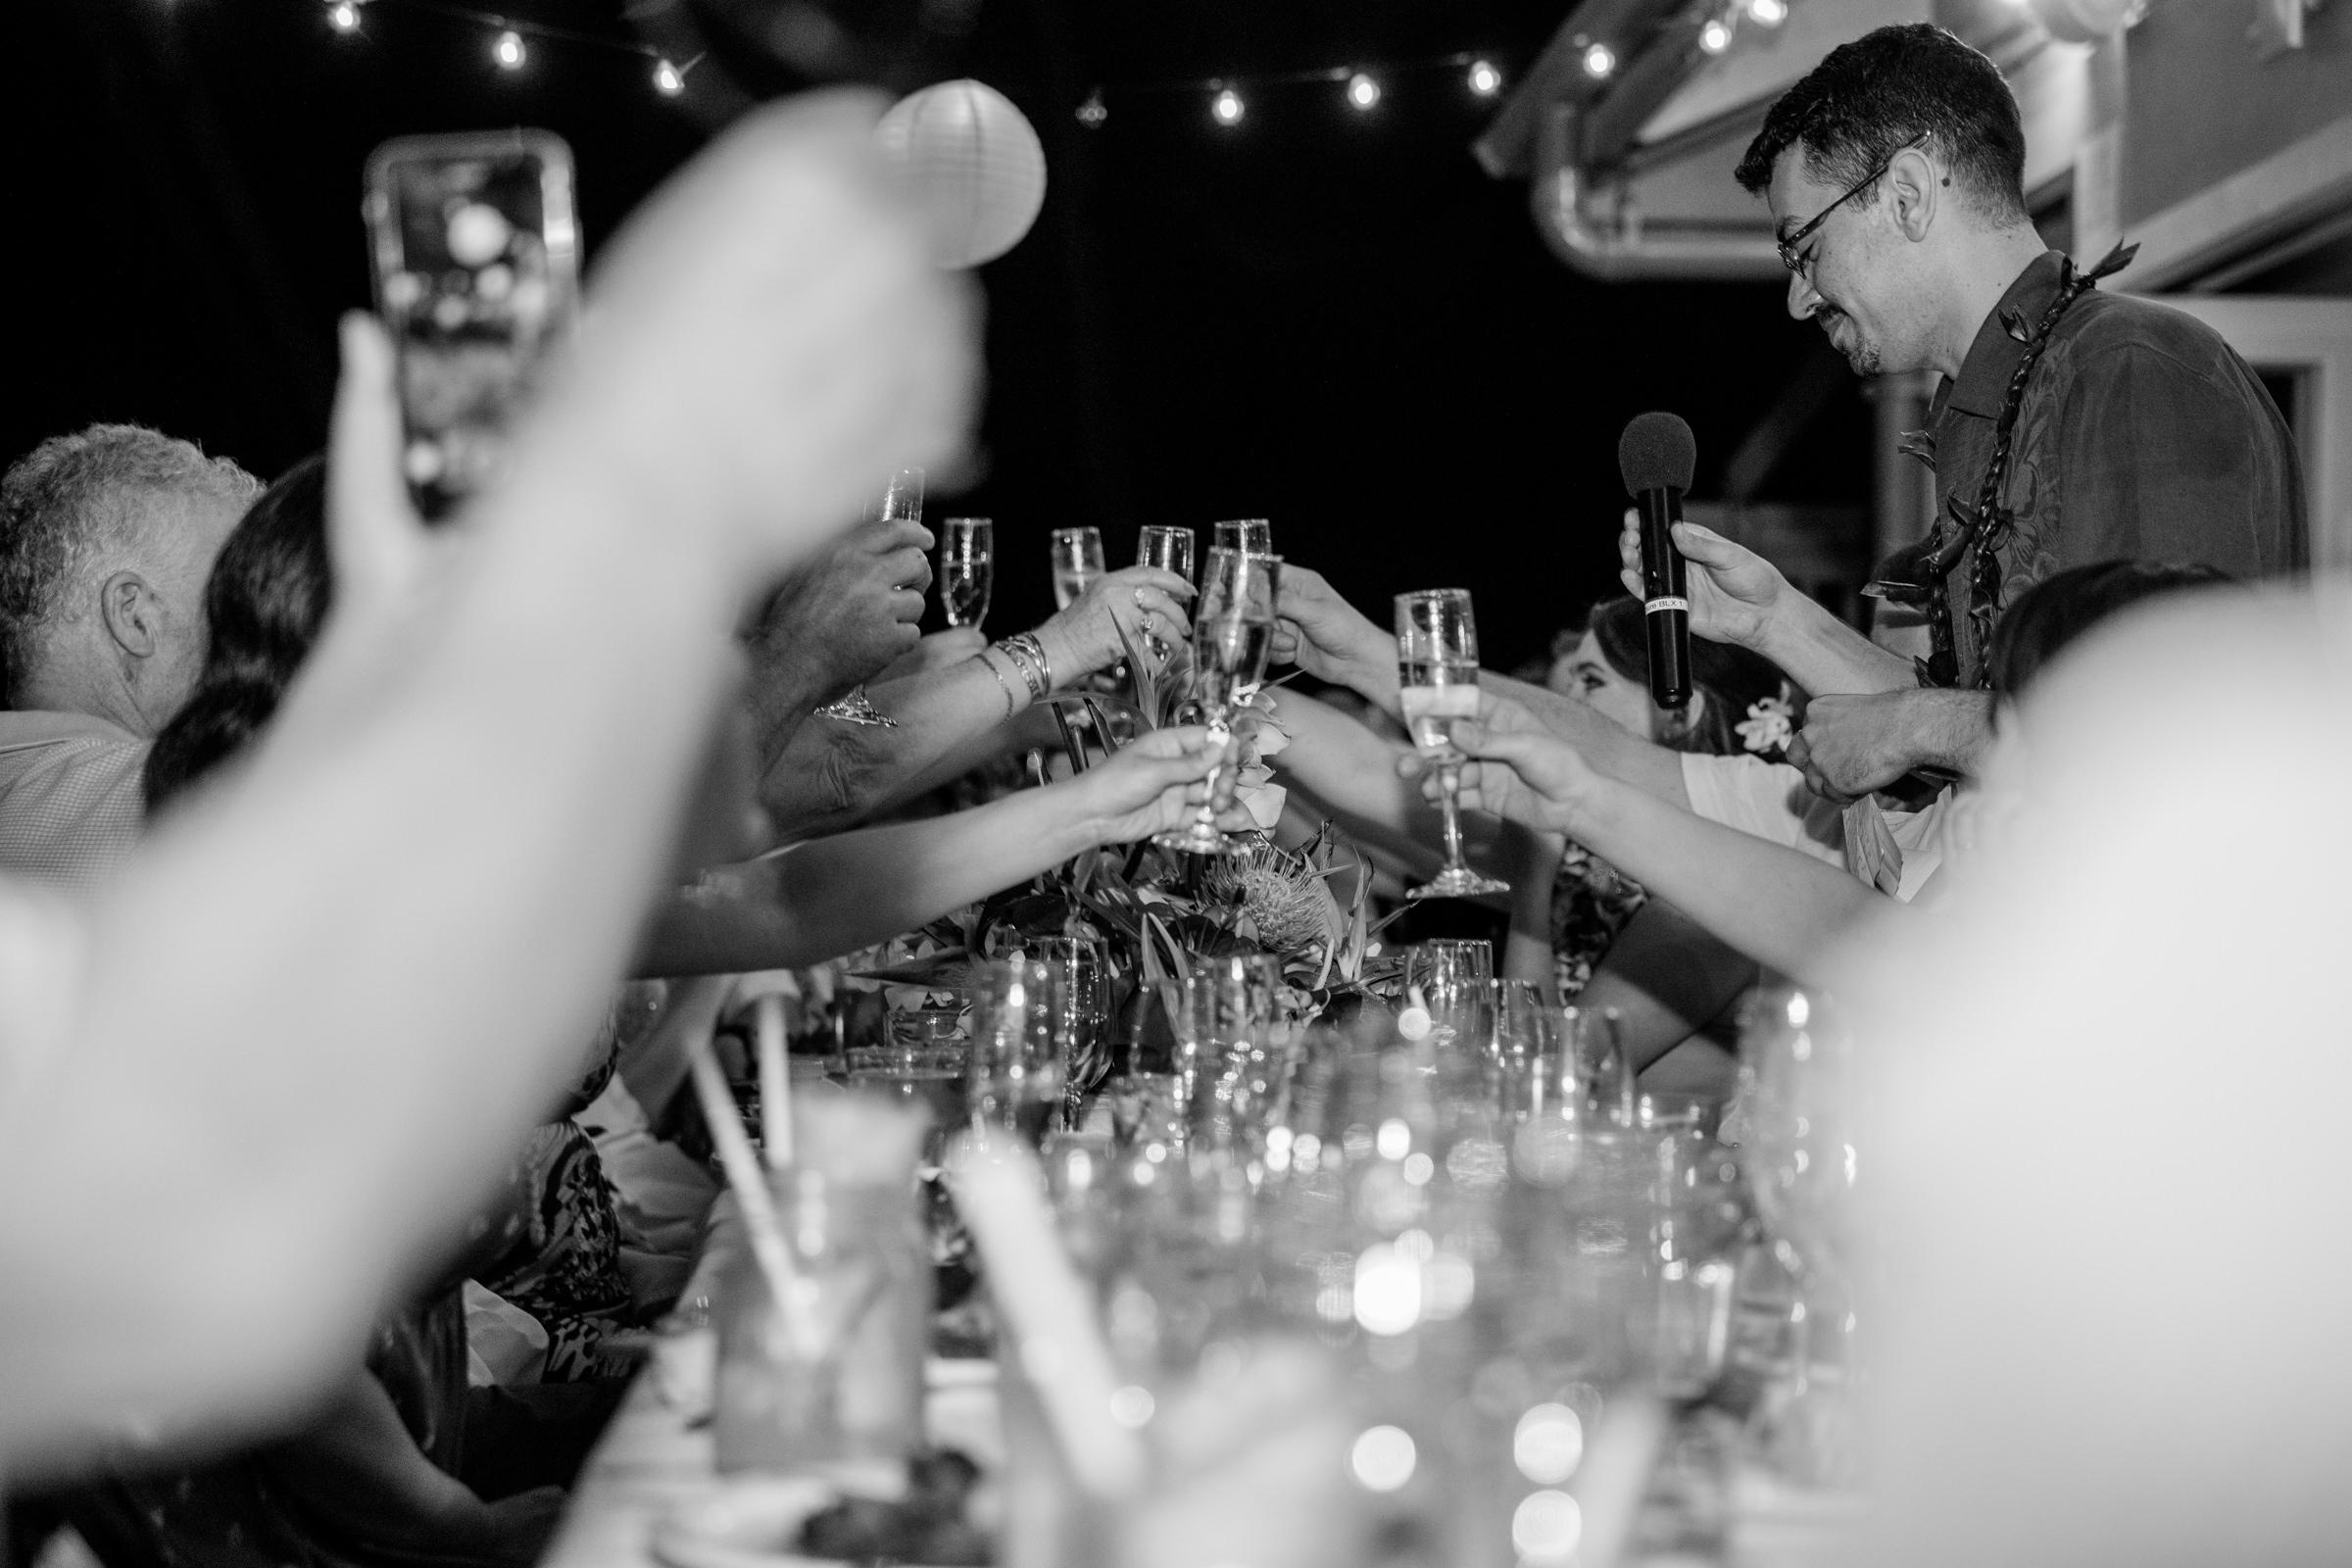 wedding-photographer-photography-destination-hawaii-lake-tahoe-reception-toasts